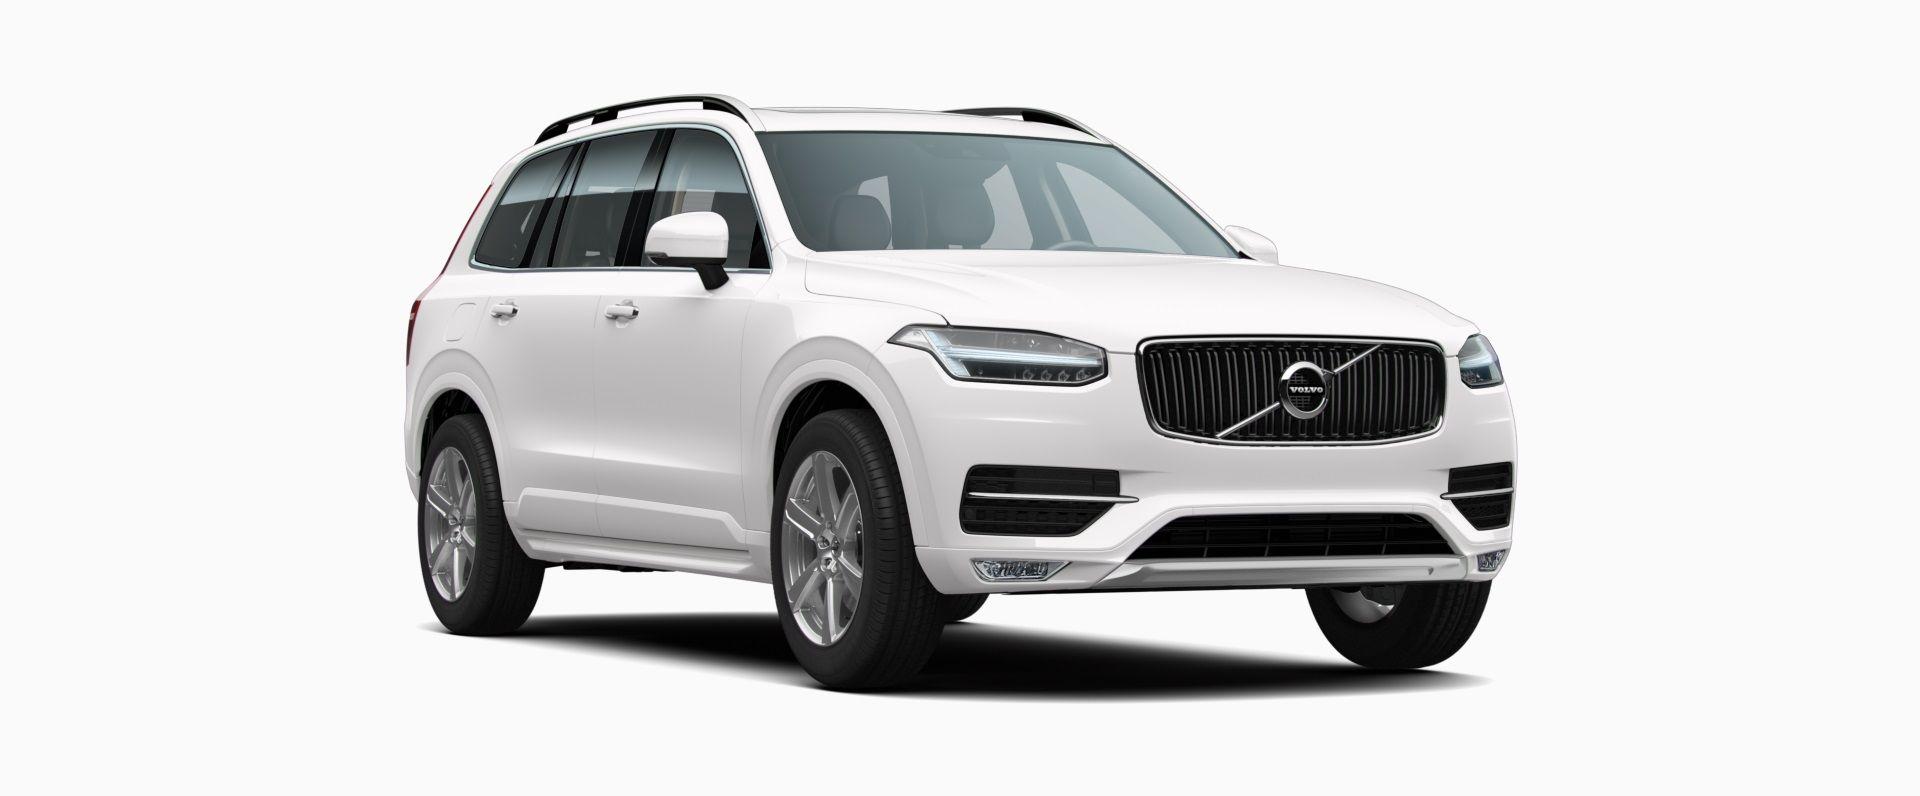 Volvo Xc90 T8 Twin Engine Plug In Hybrid 7 Passenger Inscription Volvo Cars Car Volvo